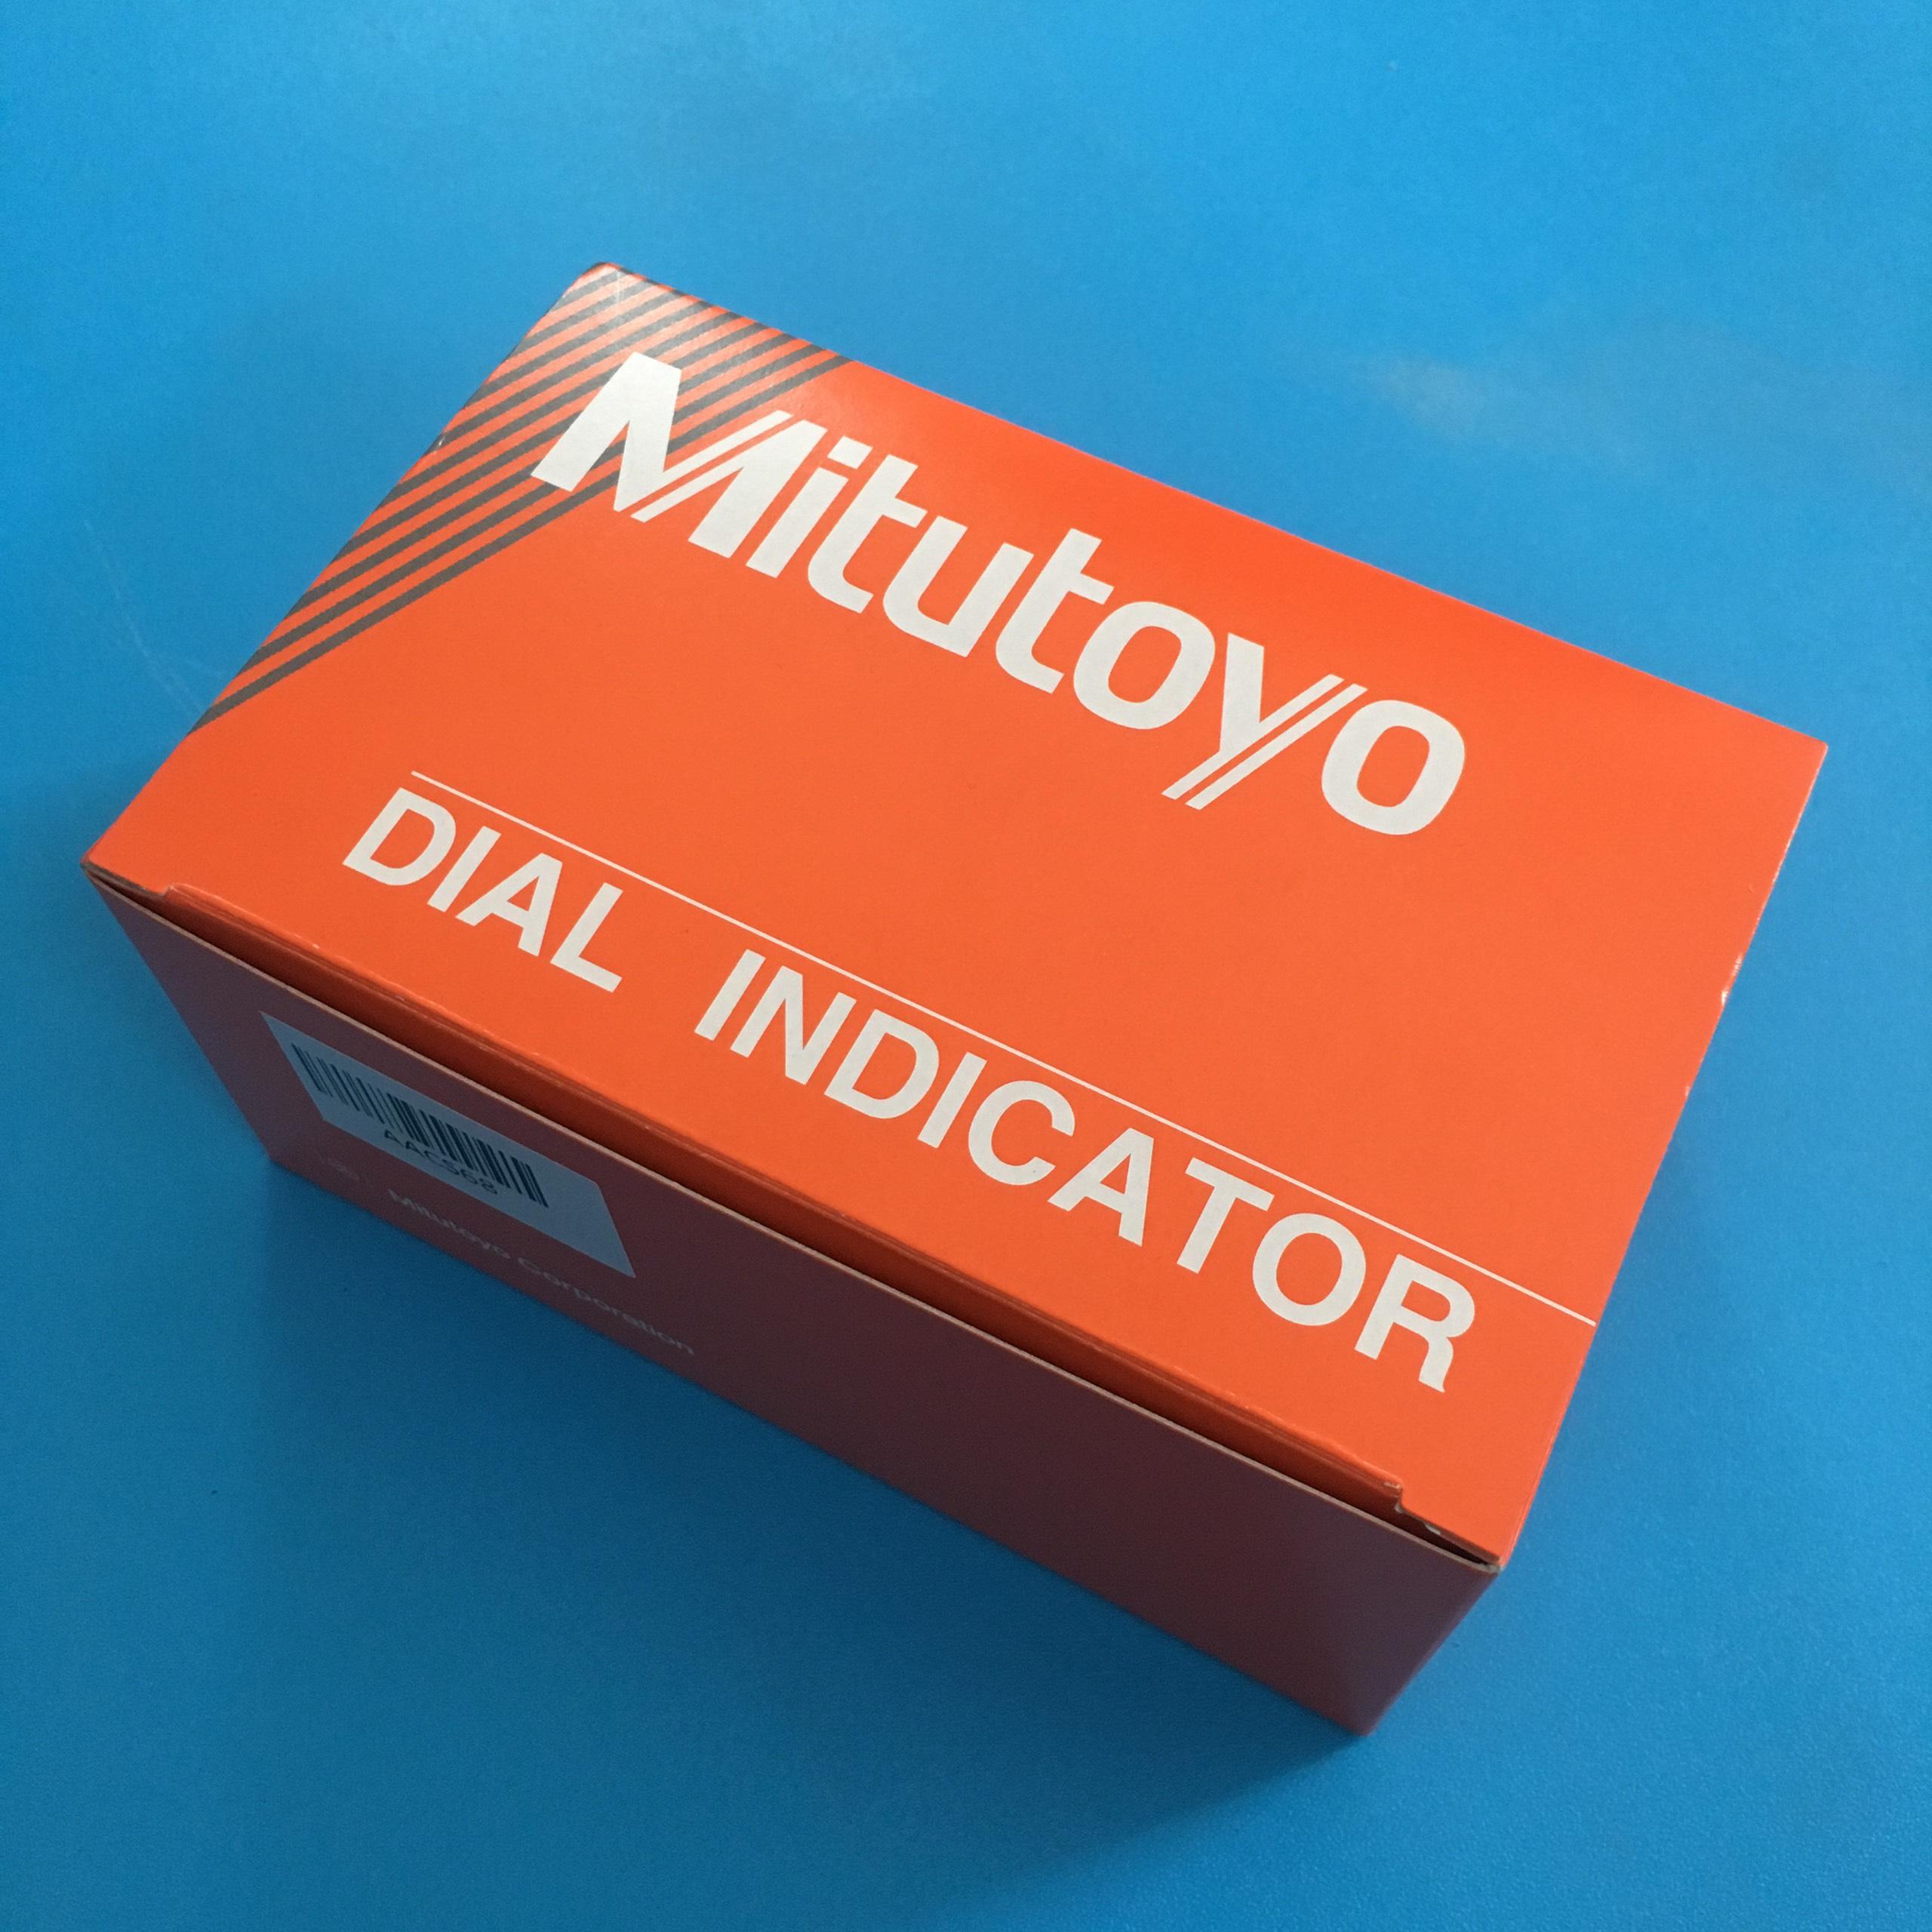 Dial indicators 2046S MITUTOYO